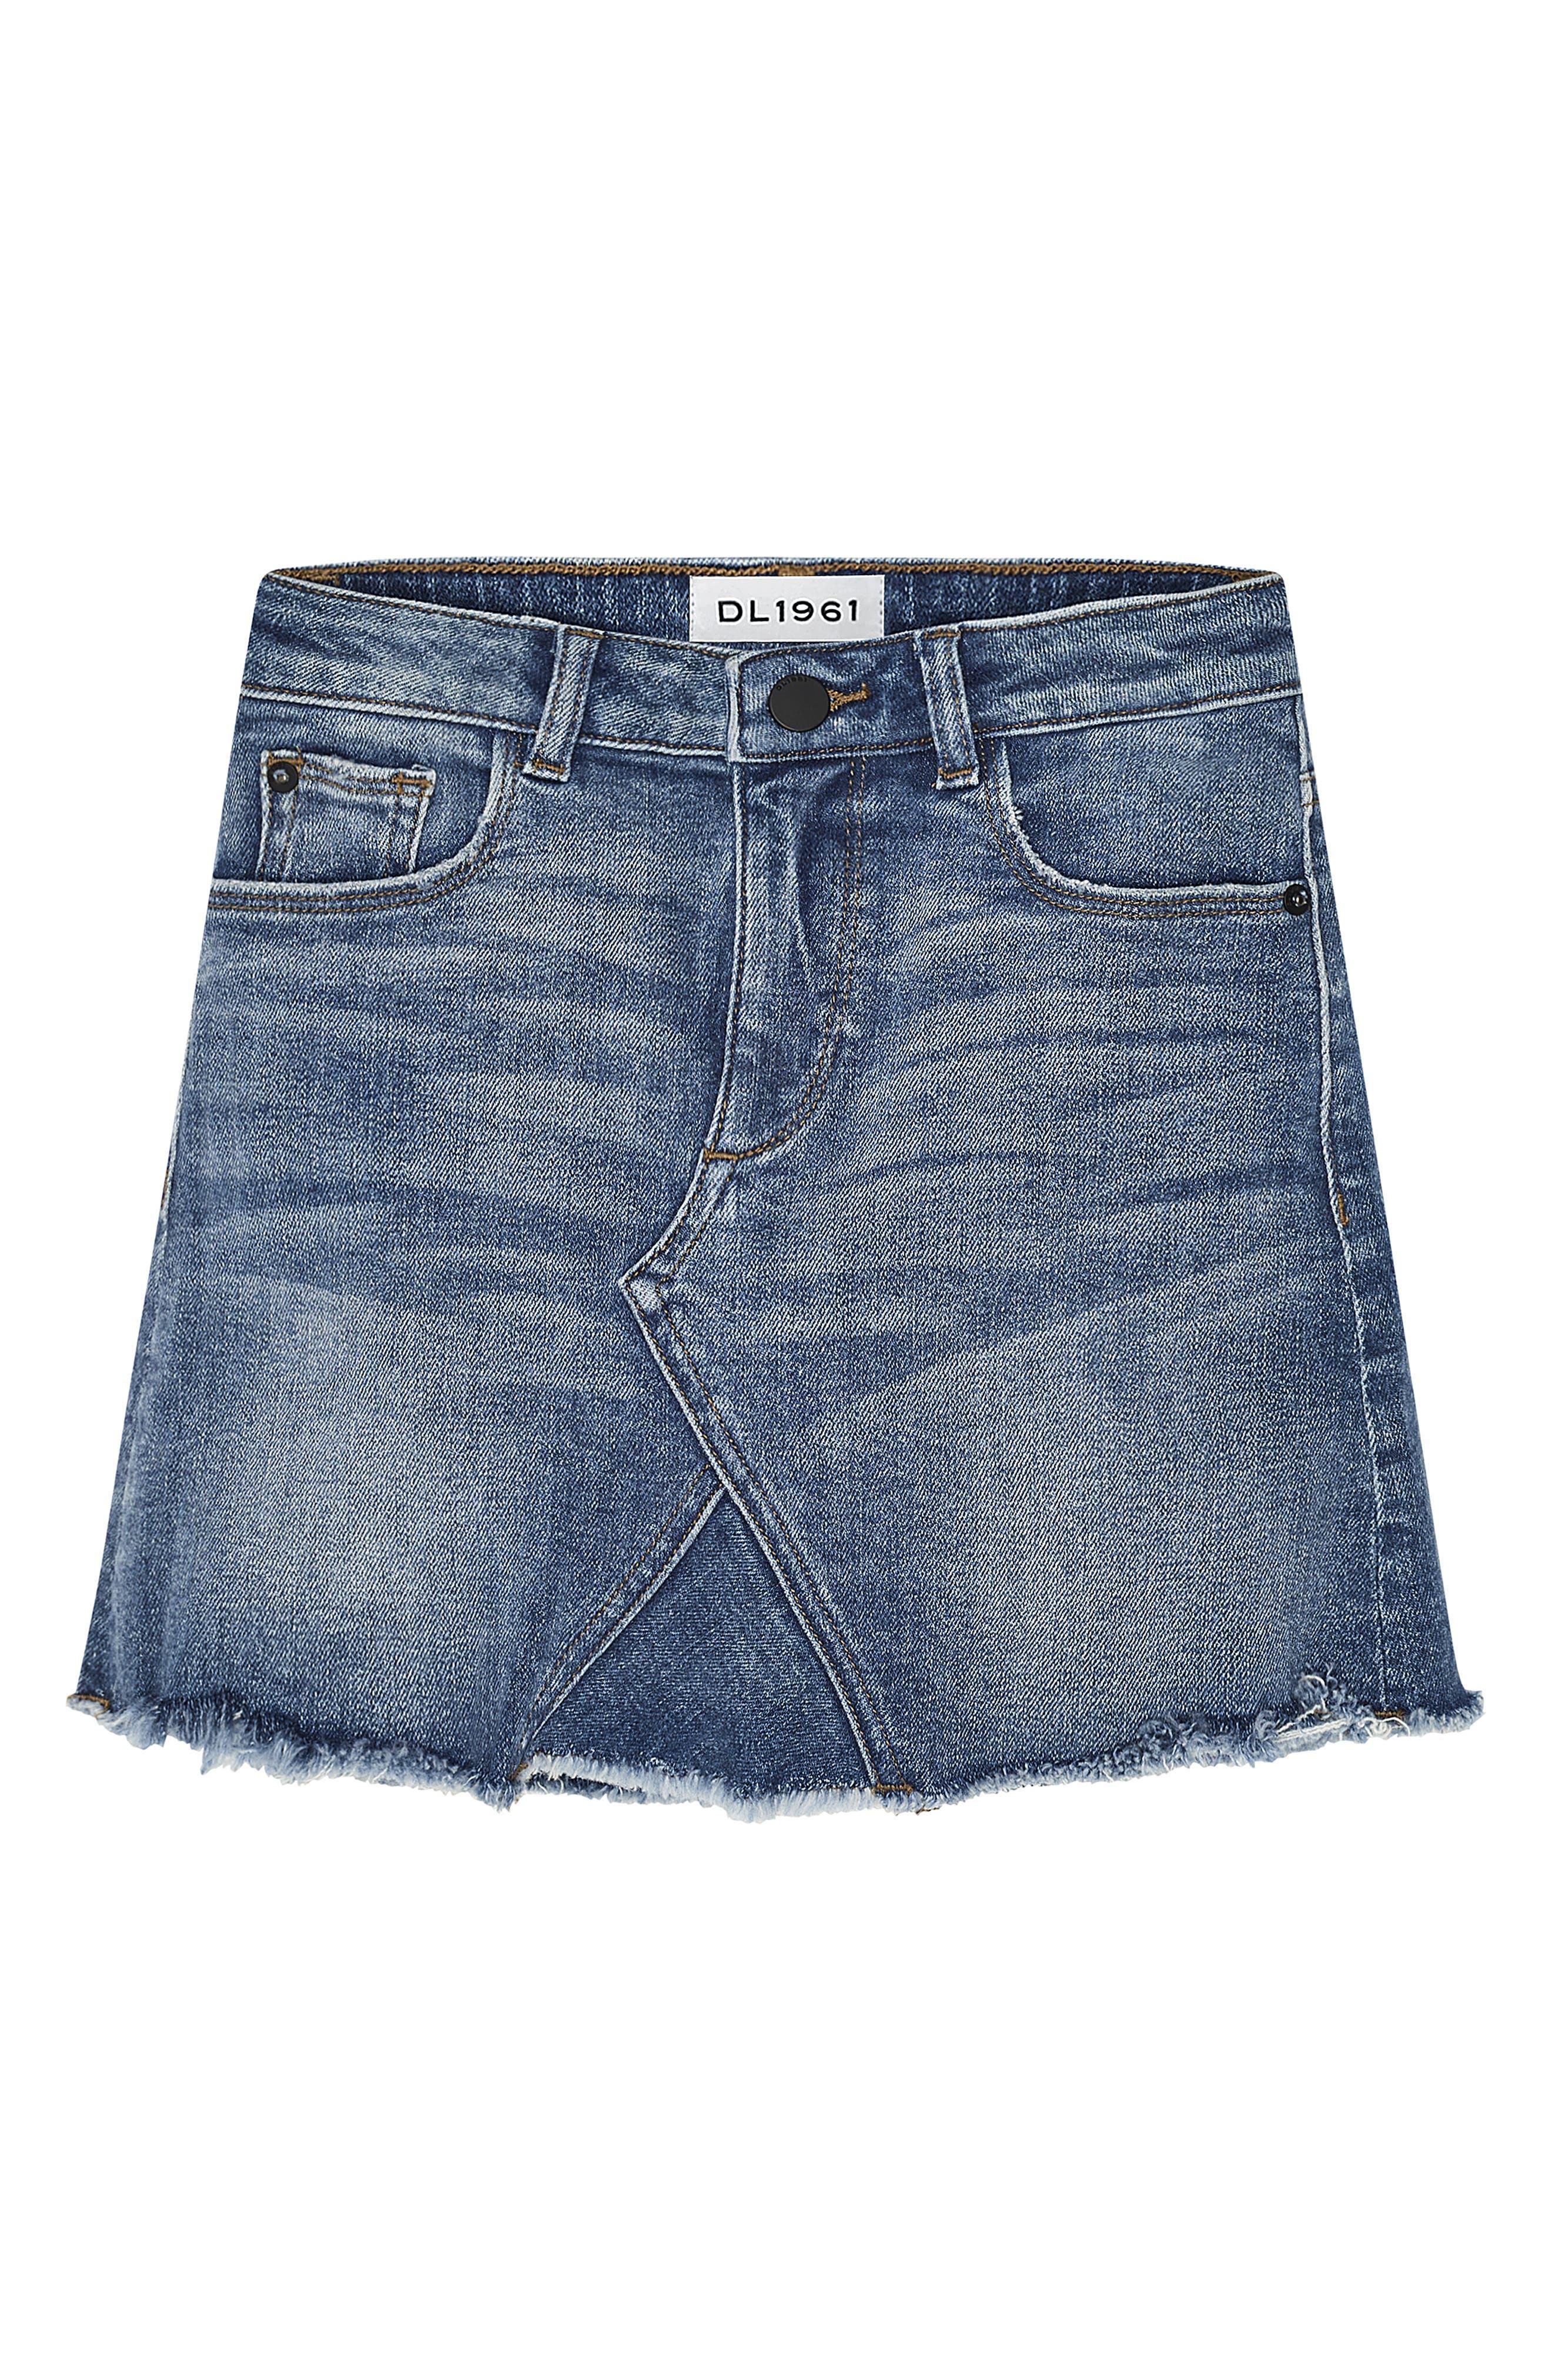 DL1961 Denim Miniskirt, Main, color, BLUE ROSE